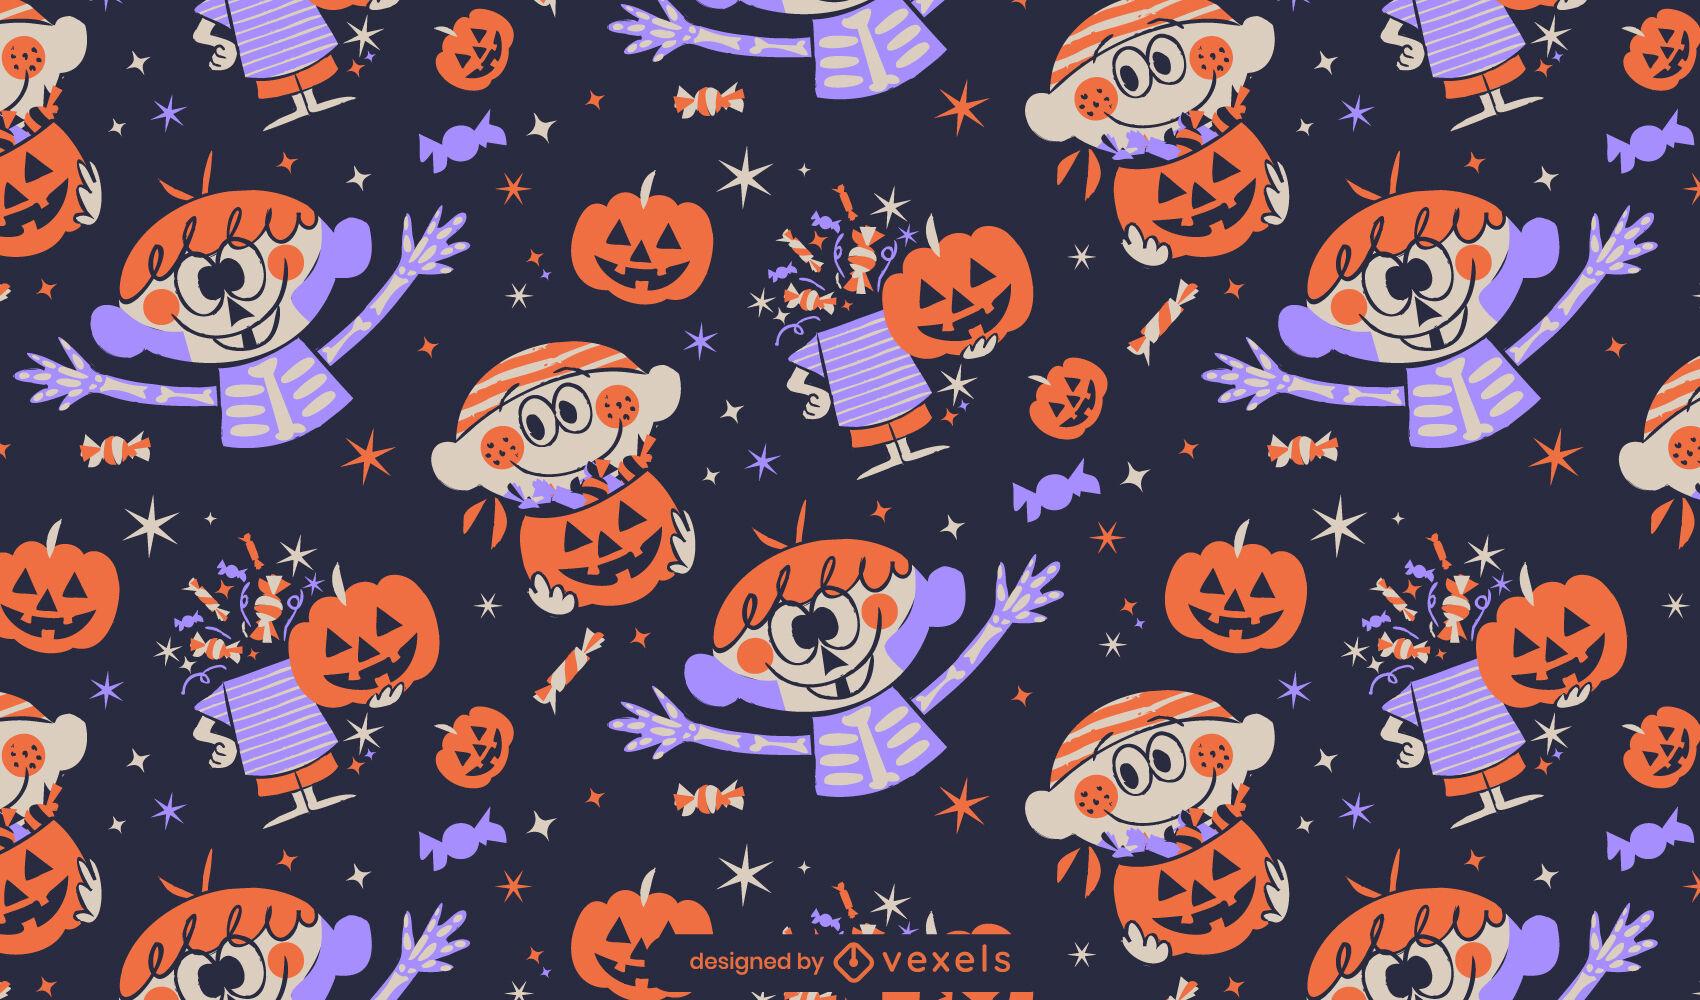 Retro cartoon halloween pattern